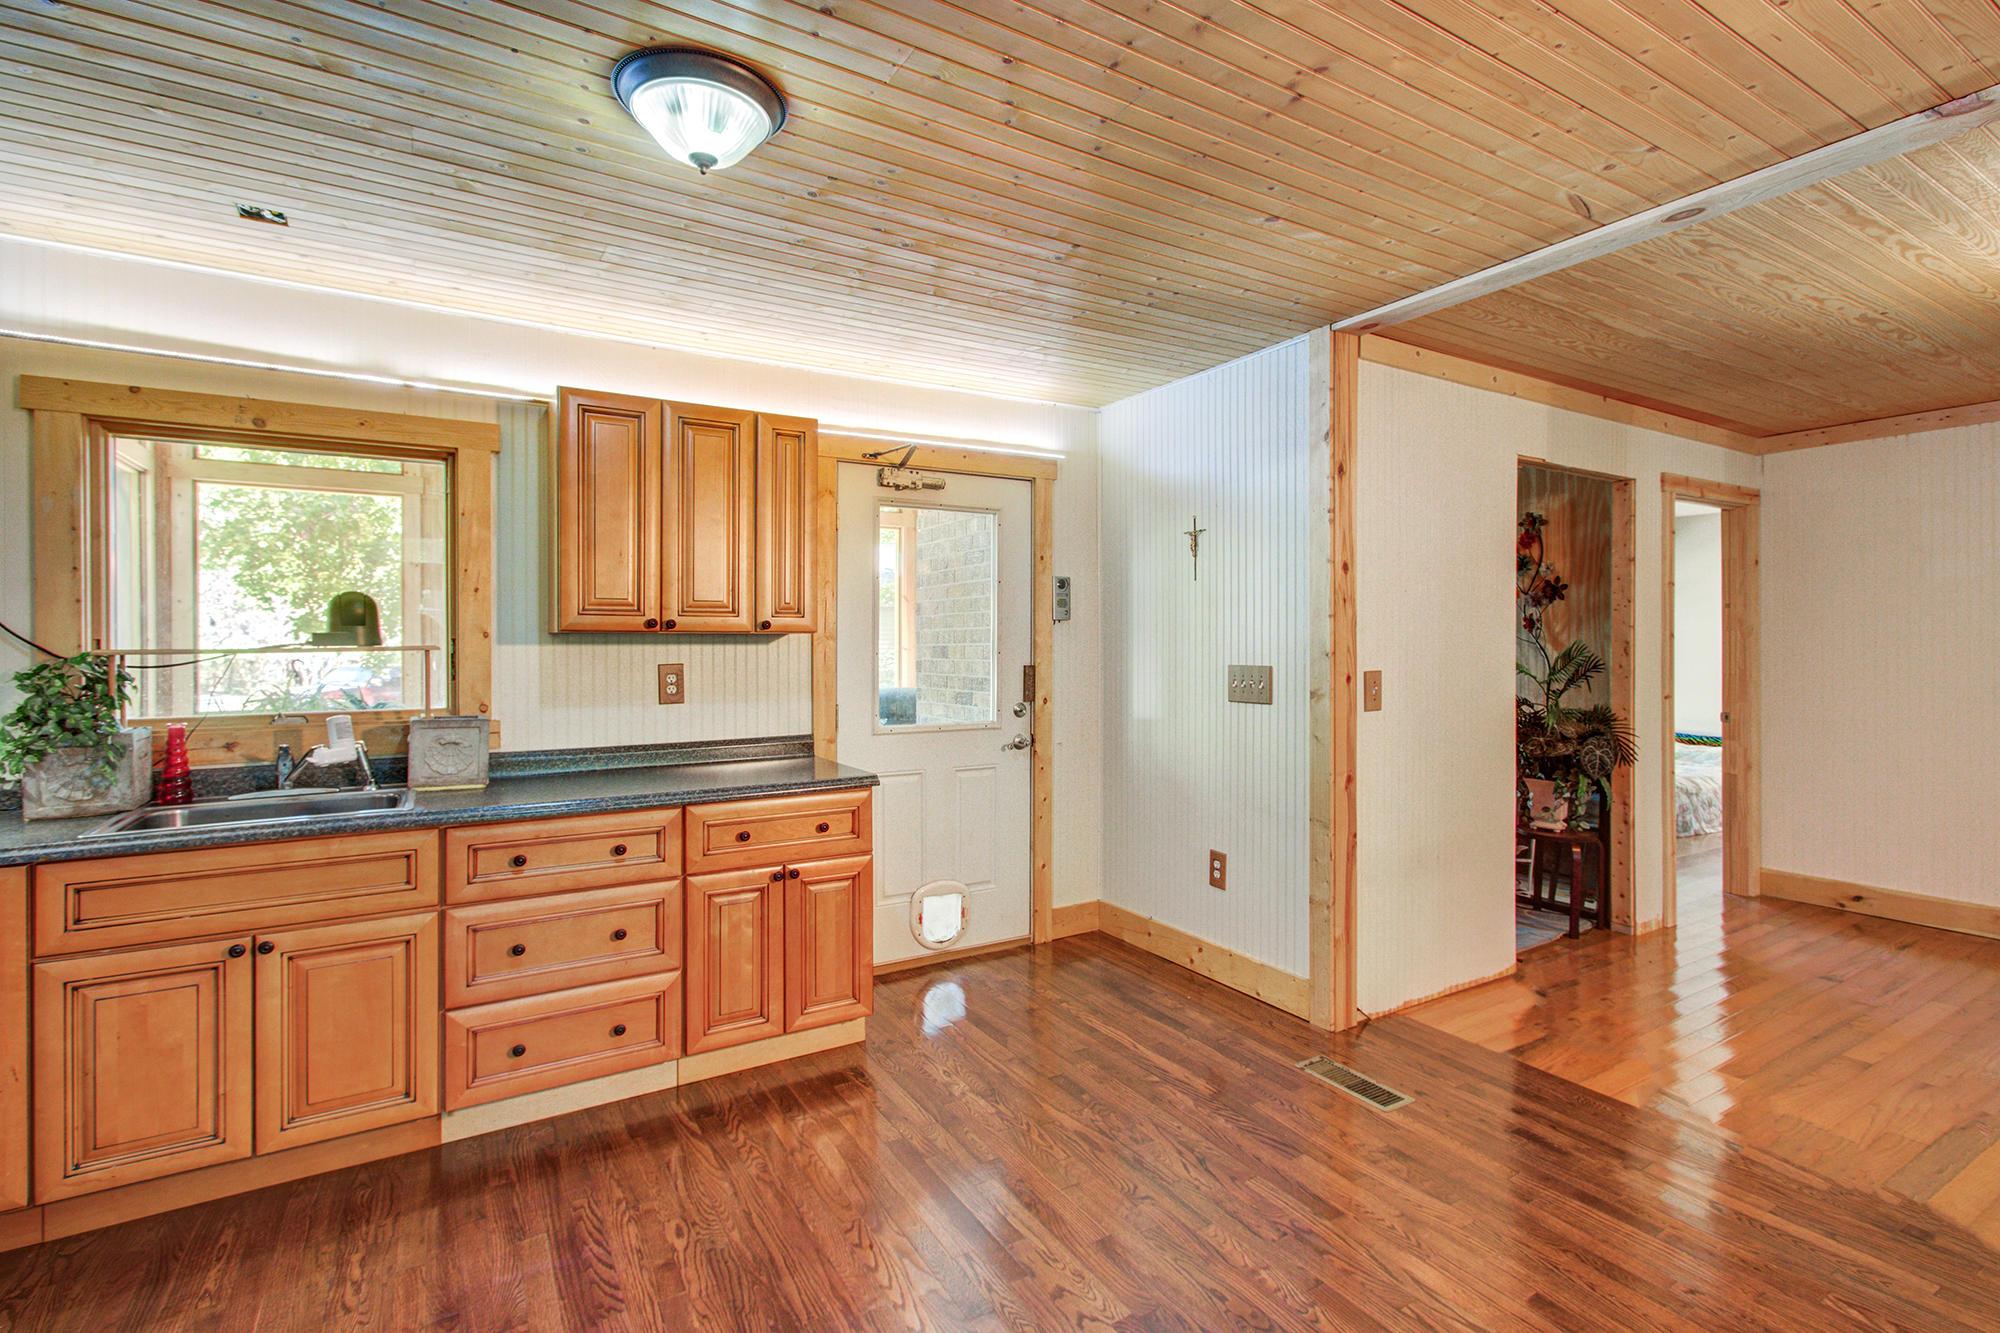 Wando Lakes Homes For Sale - 858 Fairlawn, Mount Pleasant, SC - 11